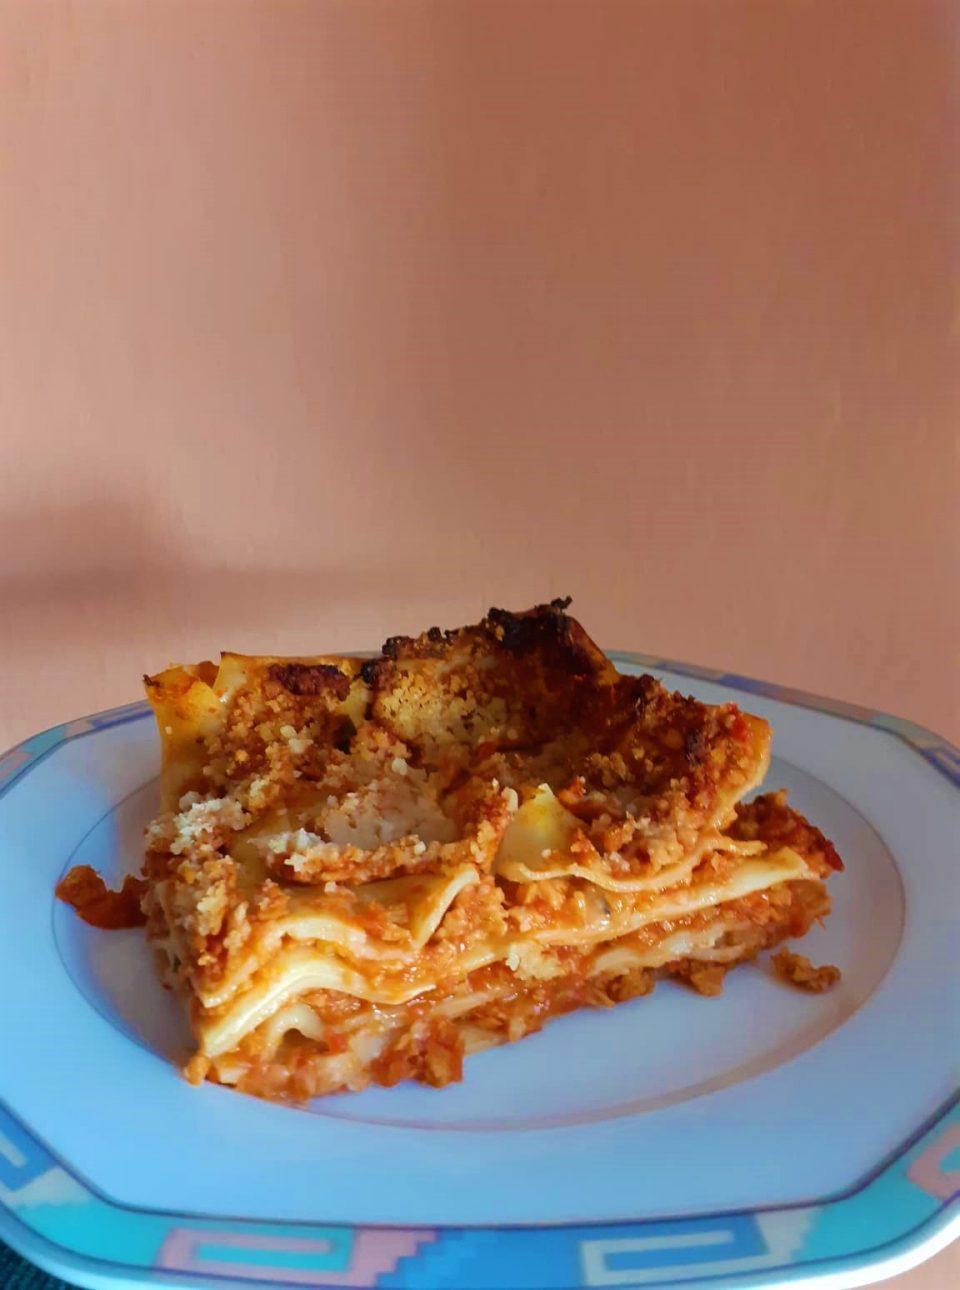 Ricetta Lasagne Vegane.Lasagna Vegana Al Ragu Di Soia Alla Faccia Degli Onnivori